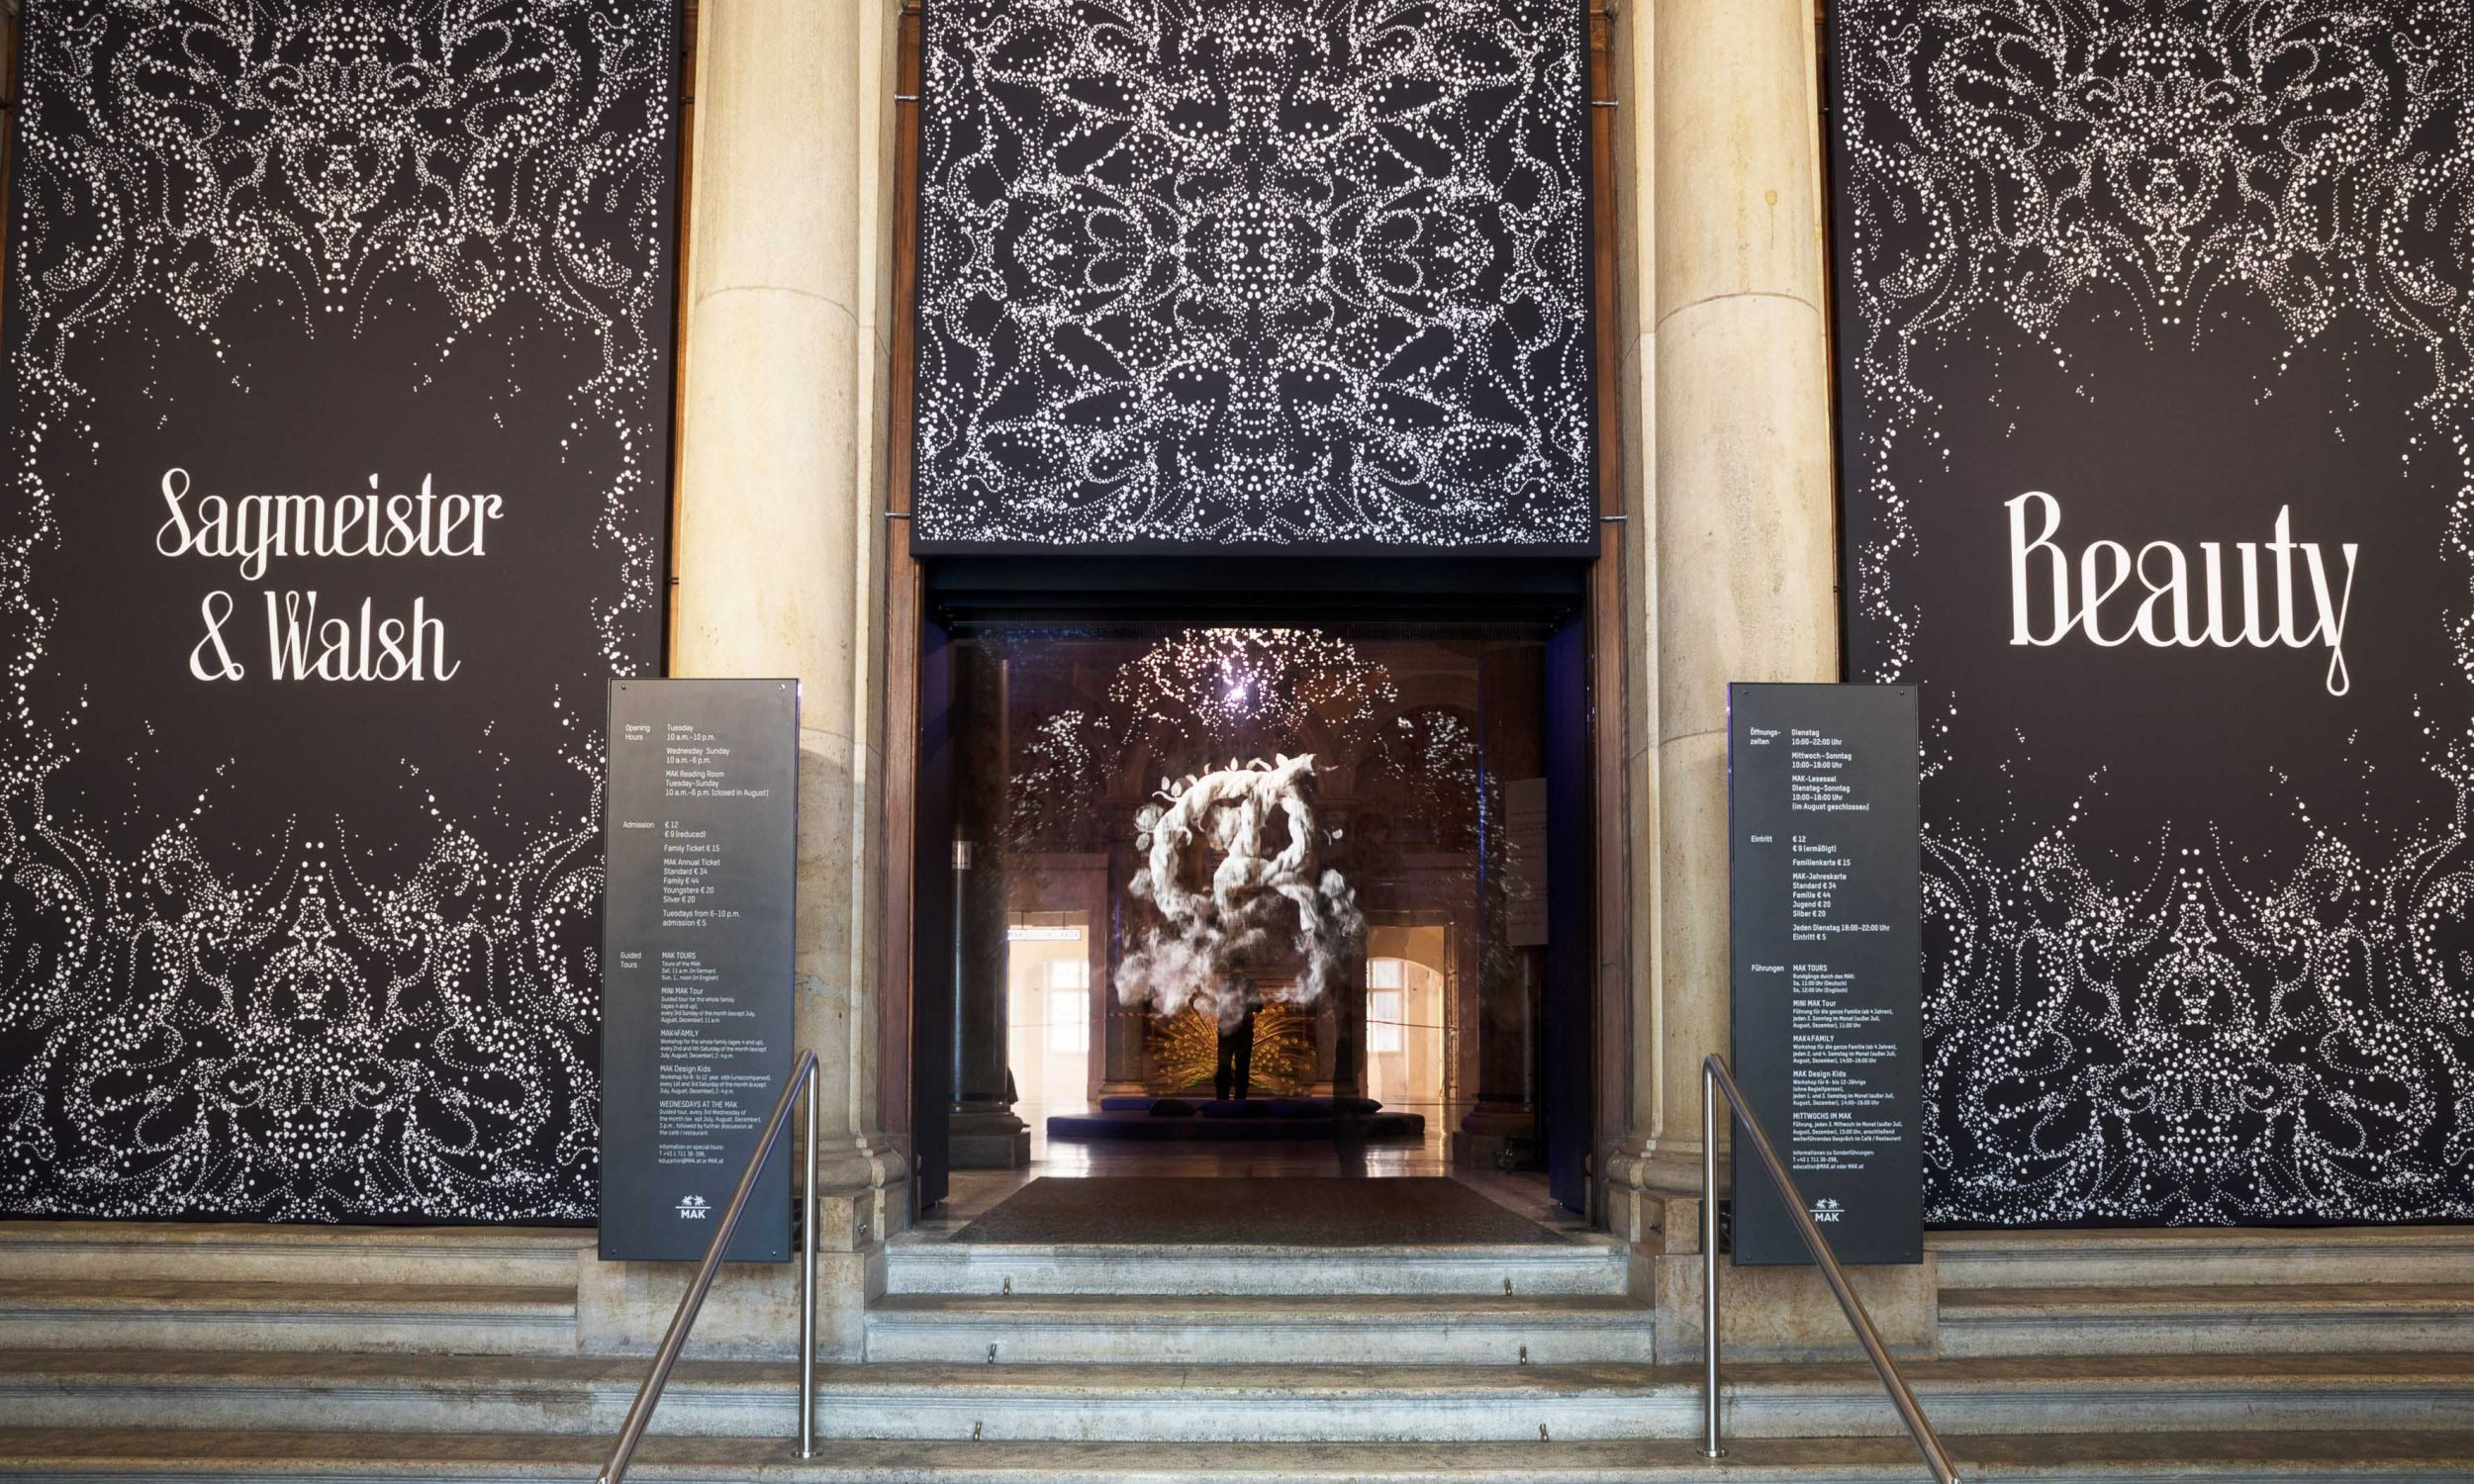 Ekspozycję przygotowali Stefan Sagmeister i Jessica Walsh. Fot. MAK DESIGN LAB © Aslan Kudrnofsky/MAK